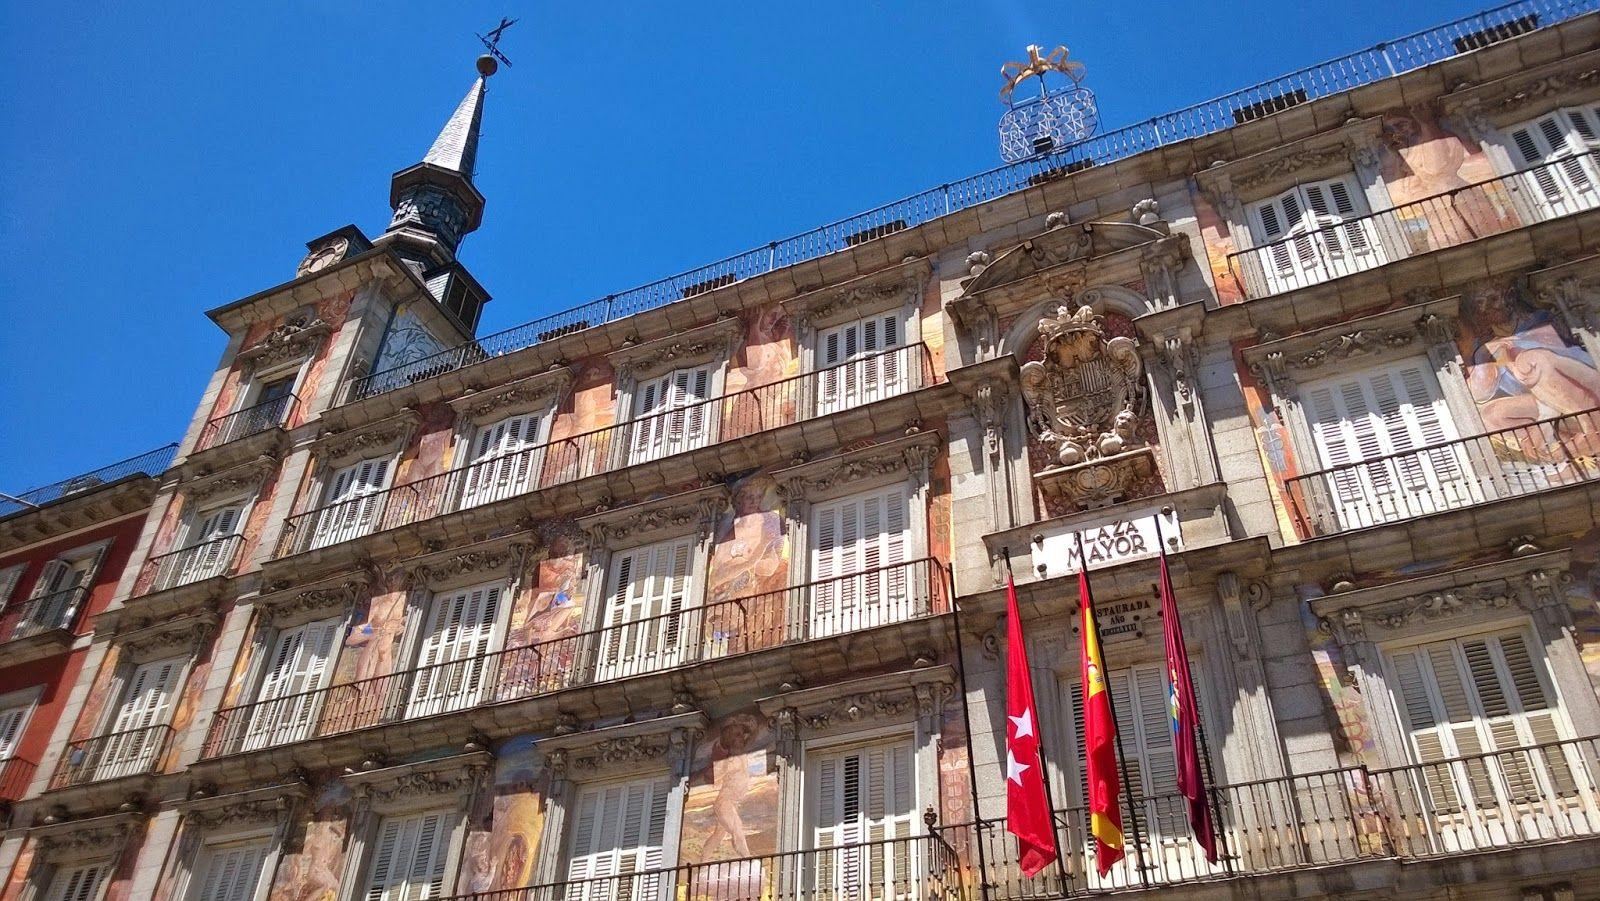 Apen matkat: Madrid osa 2, Plaza Mayor ja Mercado de San Miguel